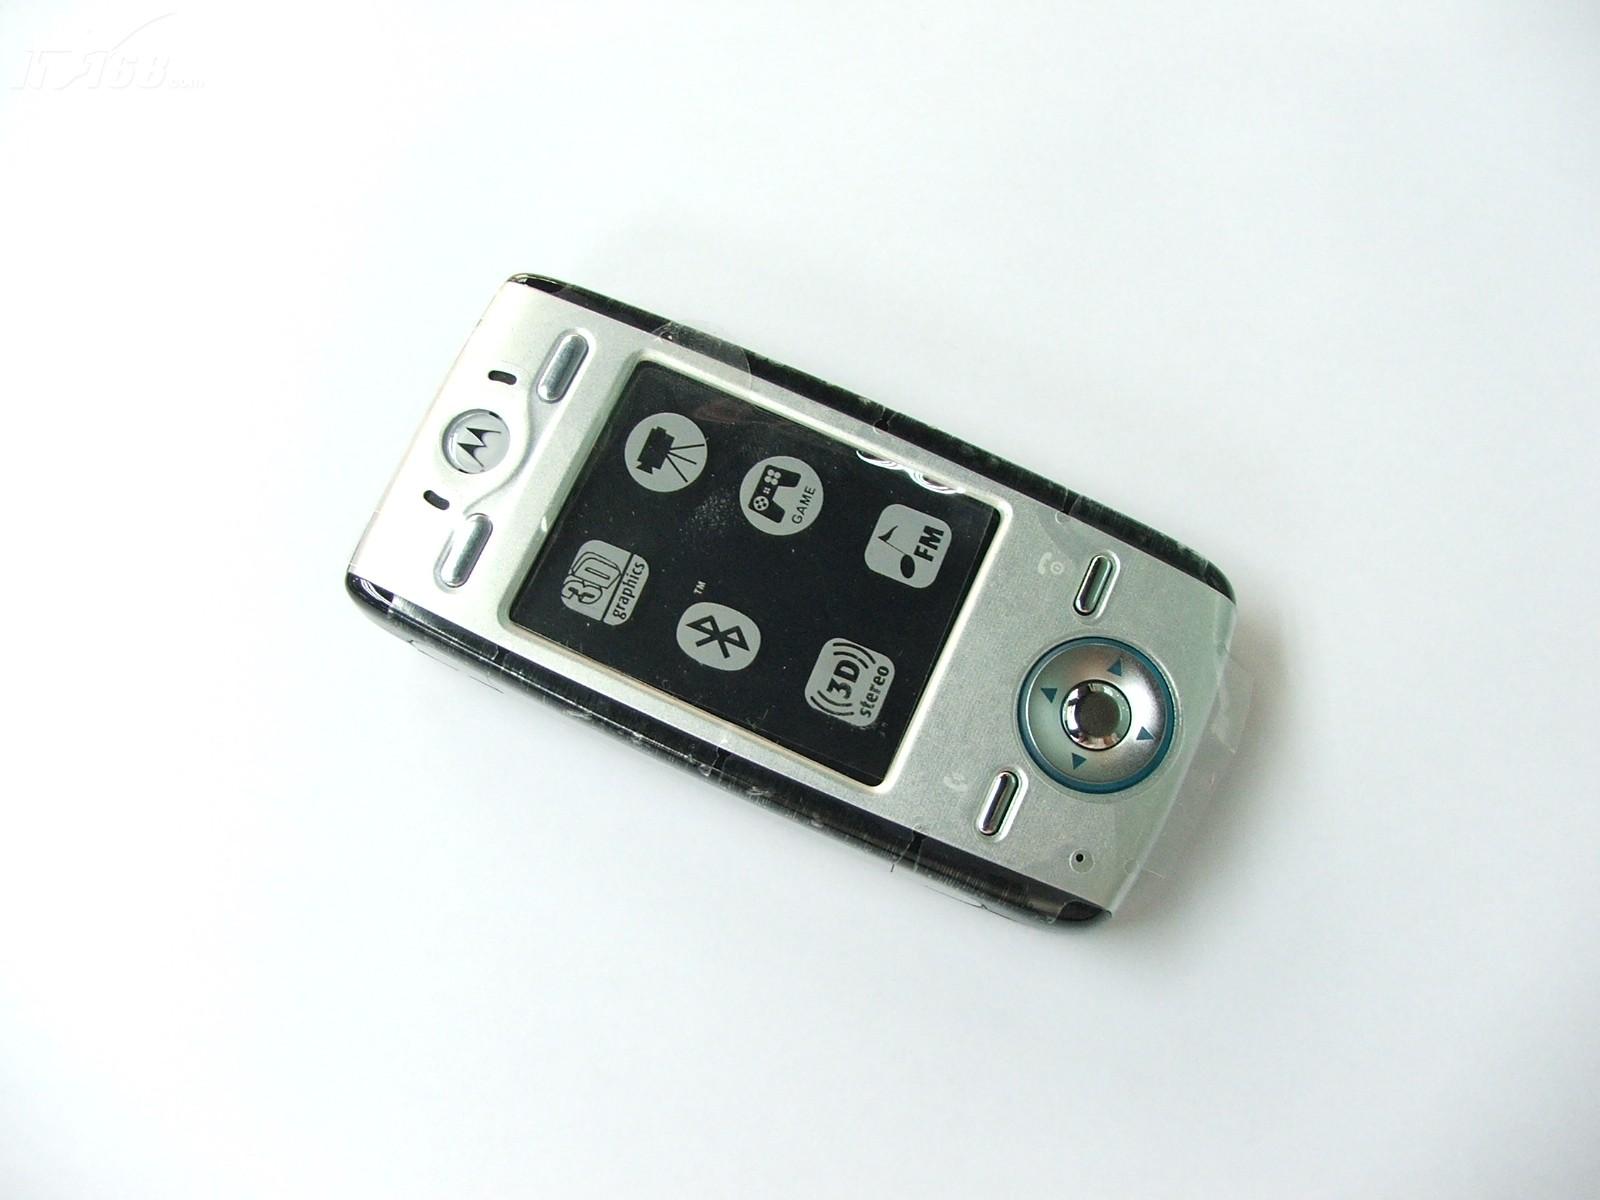 motoe680i手机产品图片14素材-it168手机图片大全